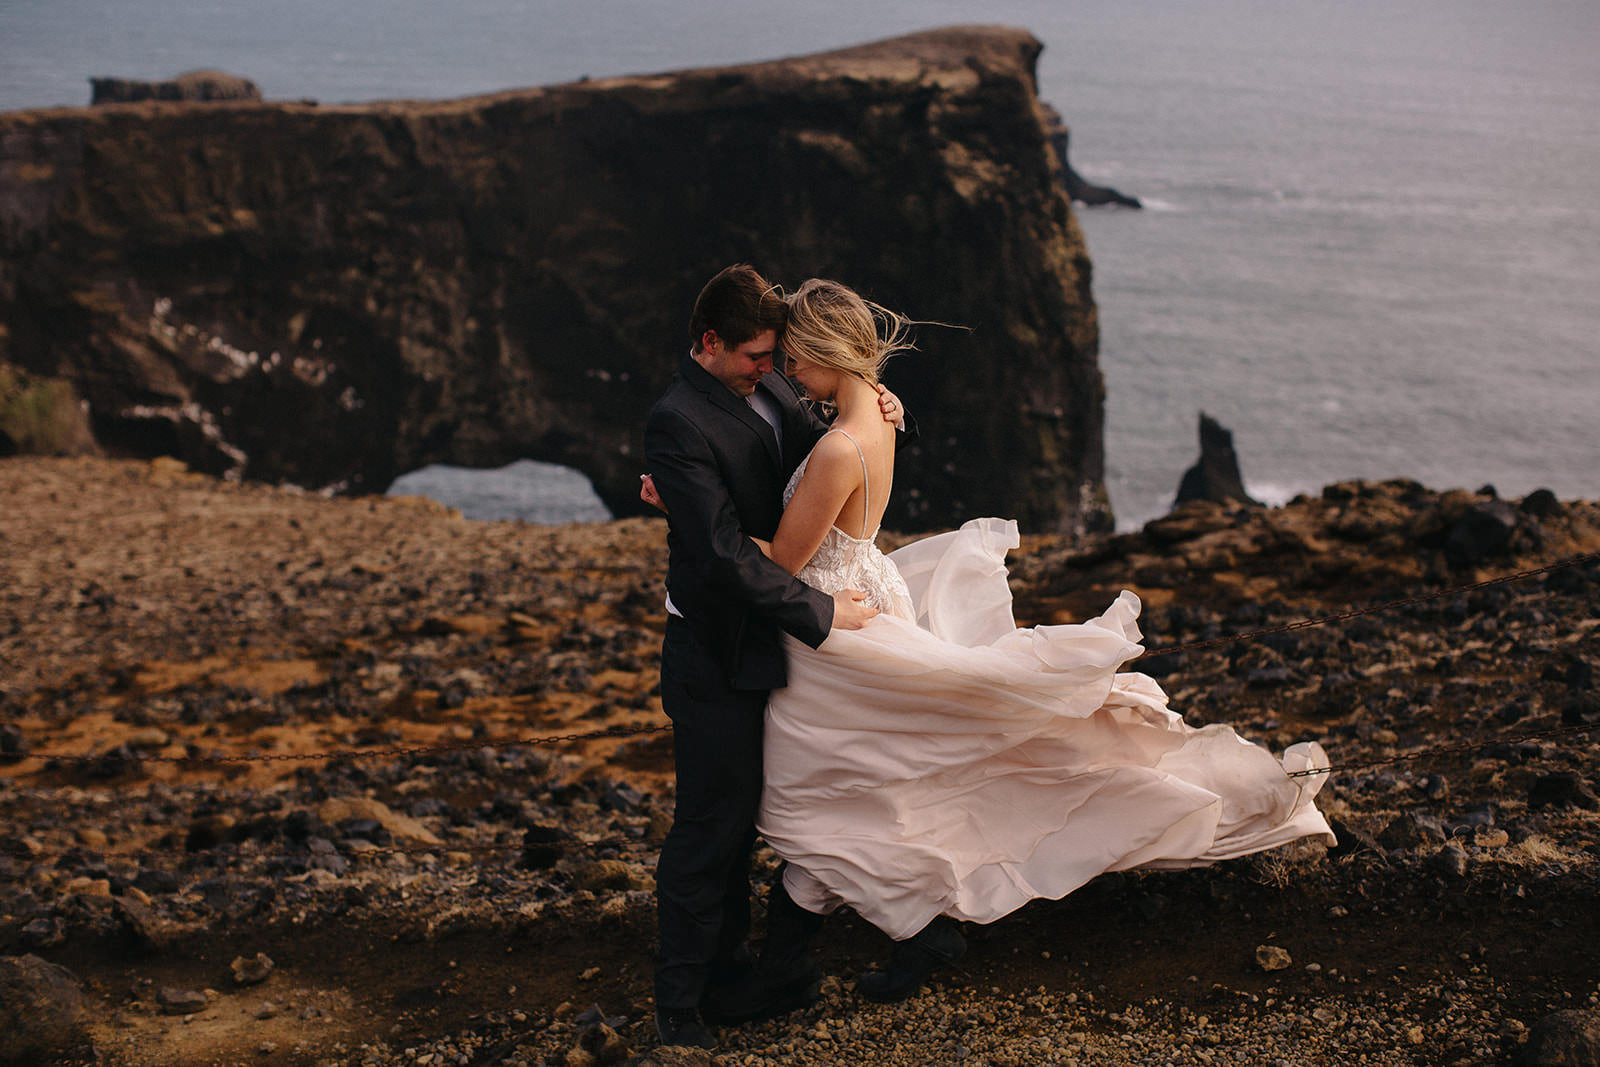 Icelandic Iceland Elopement Wedding Elope Photographer Eloping Reykjavík Vik Black Sand Beach Jökulsárlón Skogafoss Waterfall Vestrahorn Mountain Liz Osban Photography Destination 86.jpg